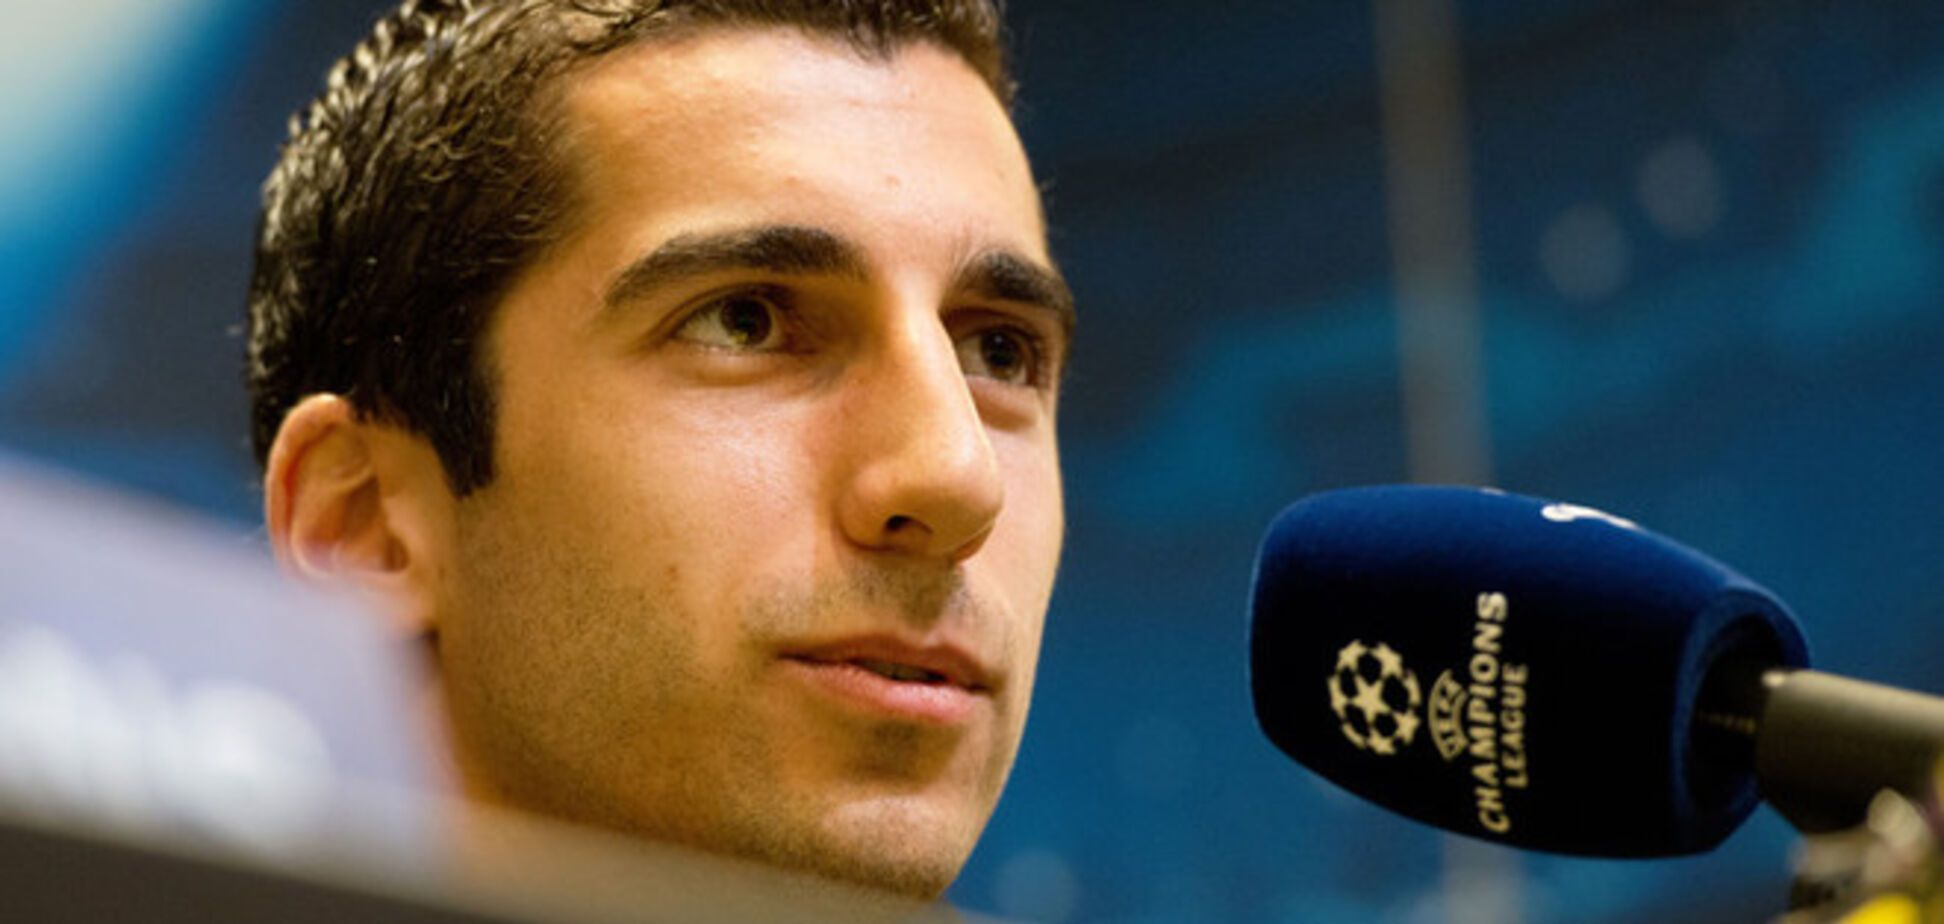 Финал Лиги Европы: 'Арсенал' психанул из-за рекордсмена 'Шахтера'